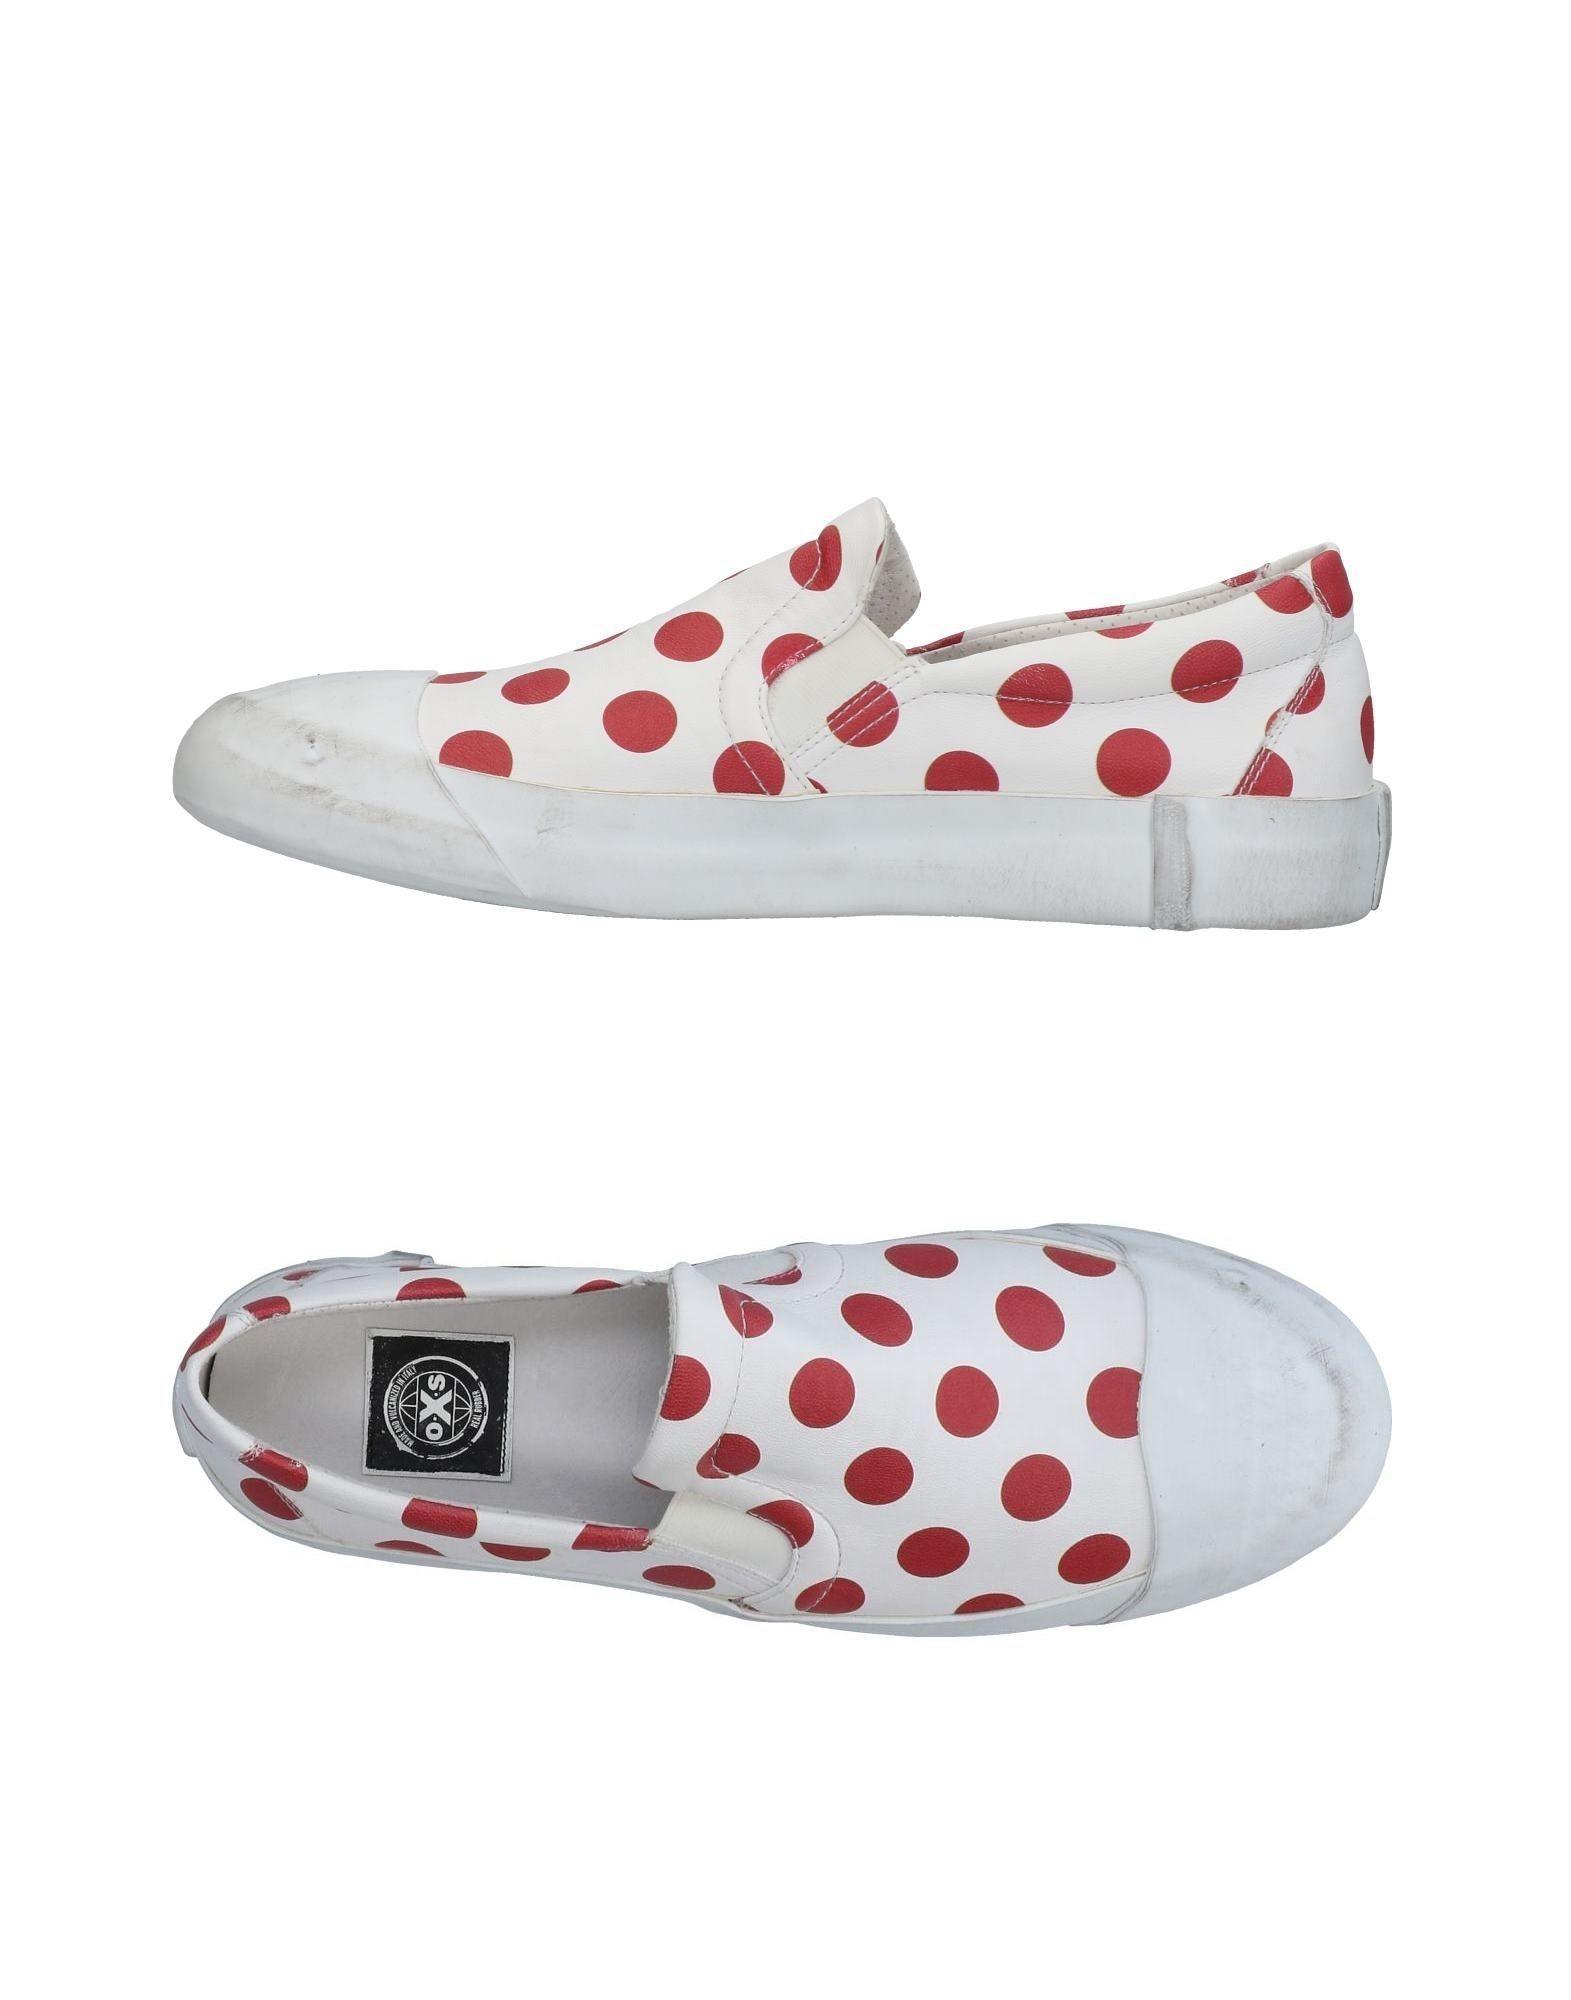 Moda Sneakers O.X.S. Donna - 11456508JK